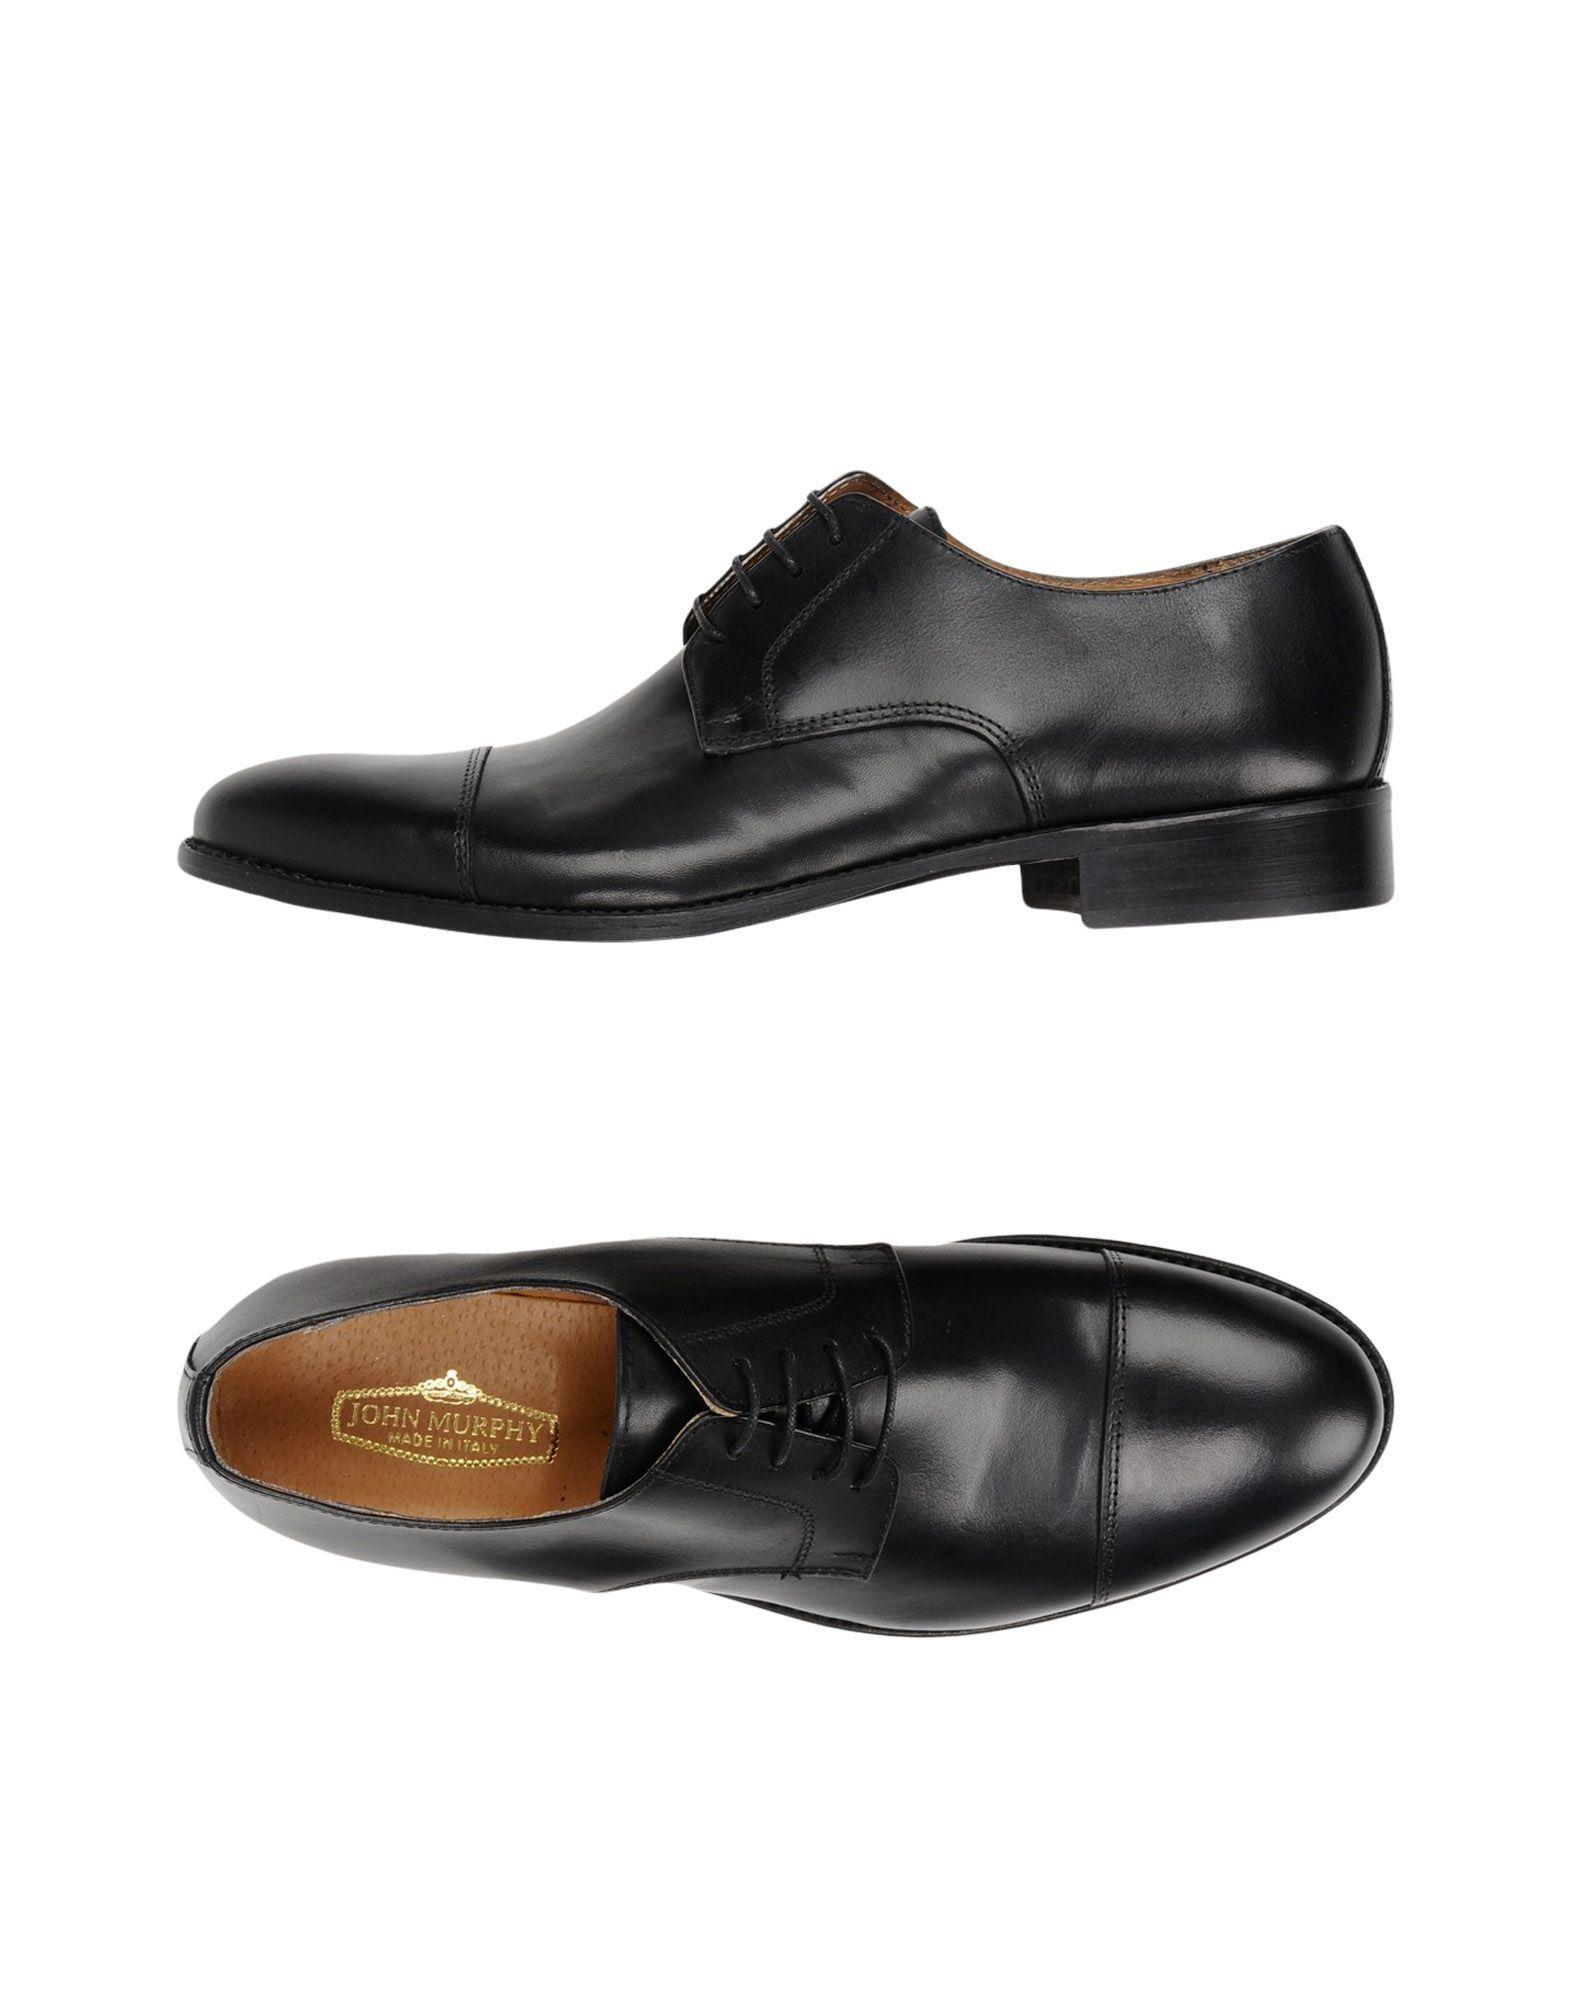 Rabatt echte Schuhe John Murphy Schnürschuhe Herren  11416118PR